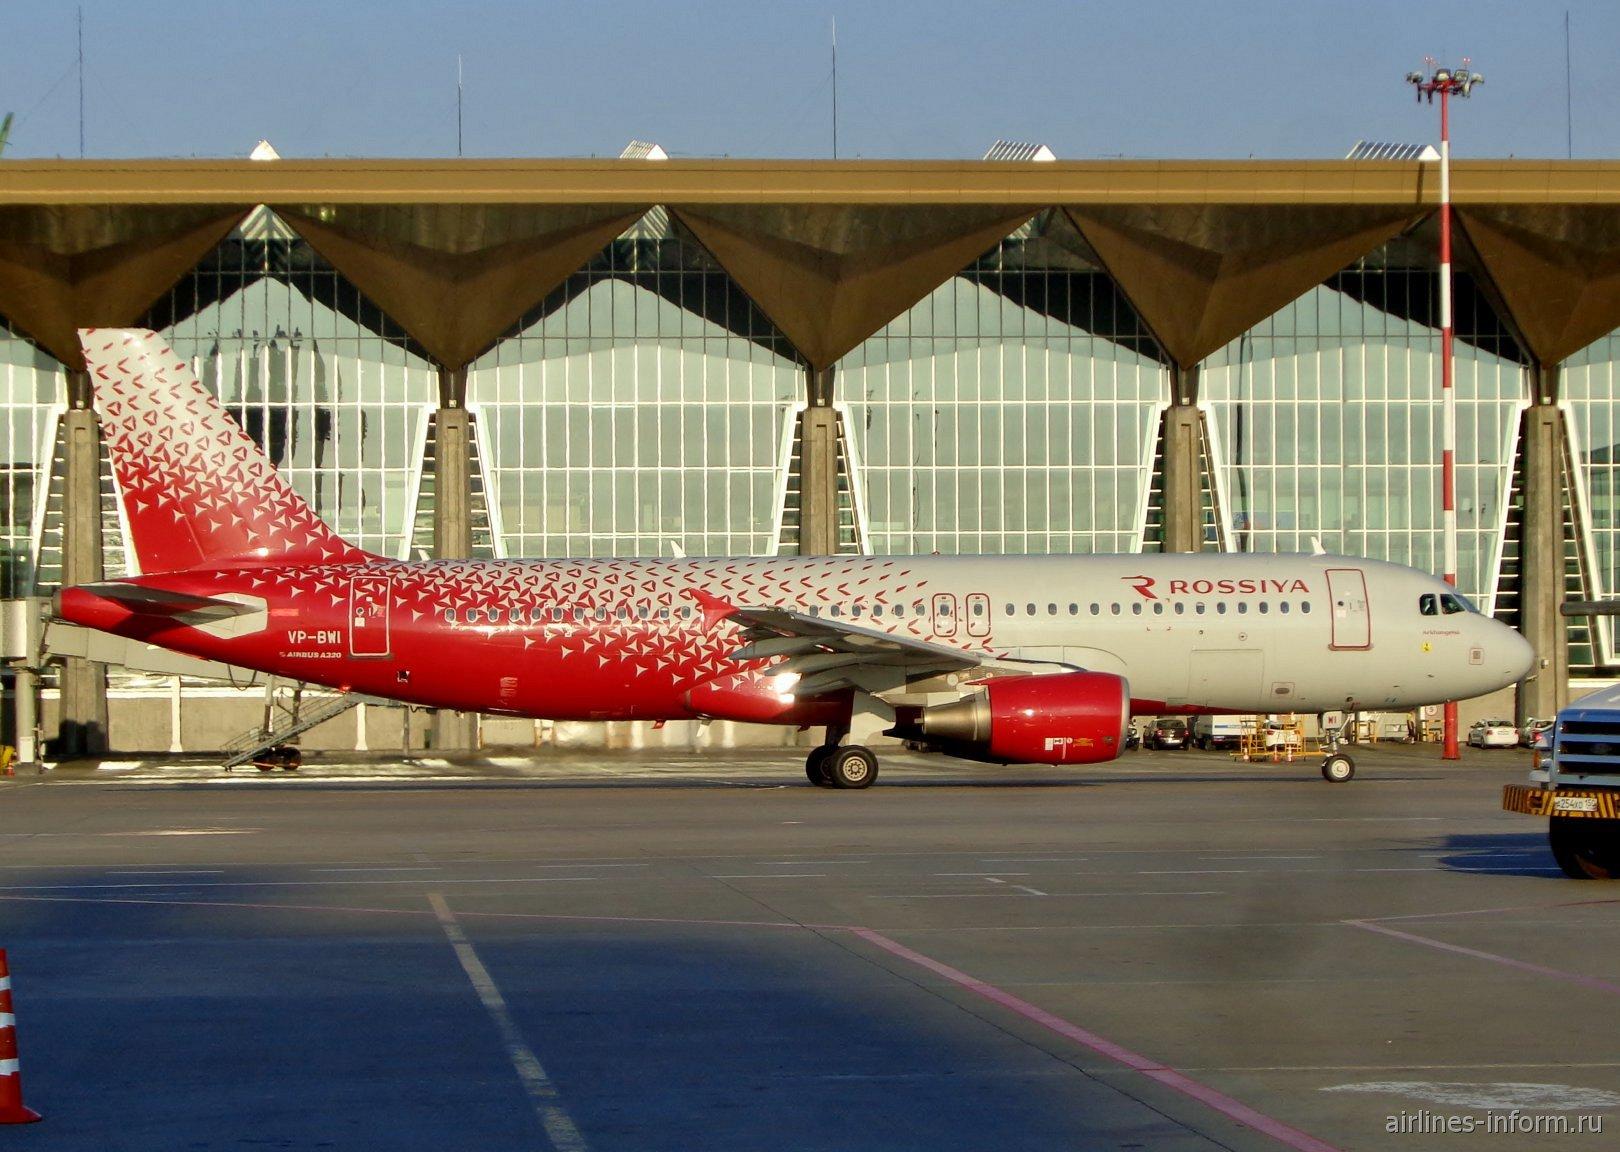 Самолет Airbus A320 VP-BWI авиакомпании